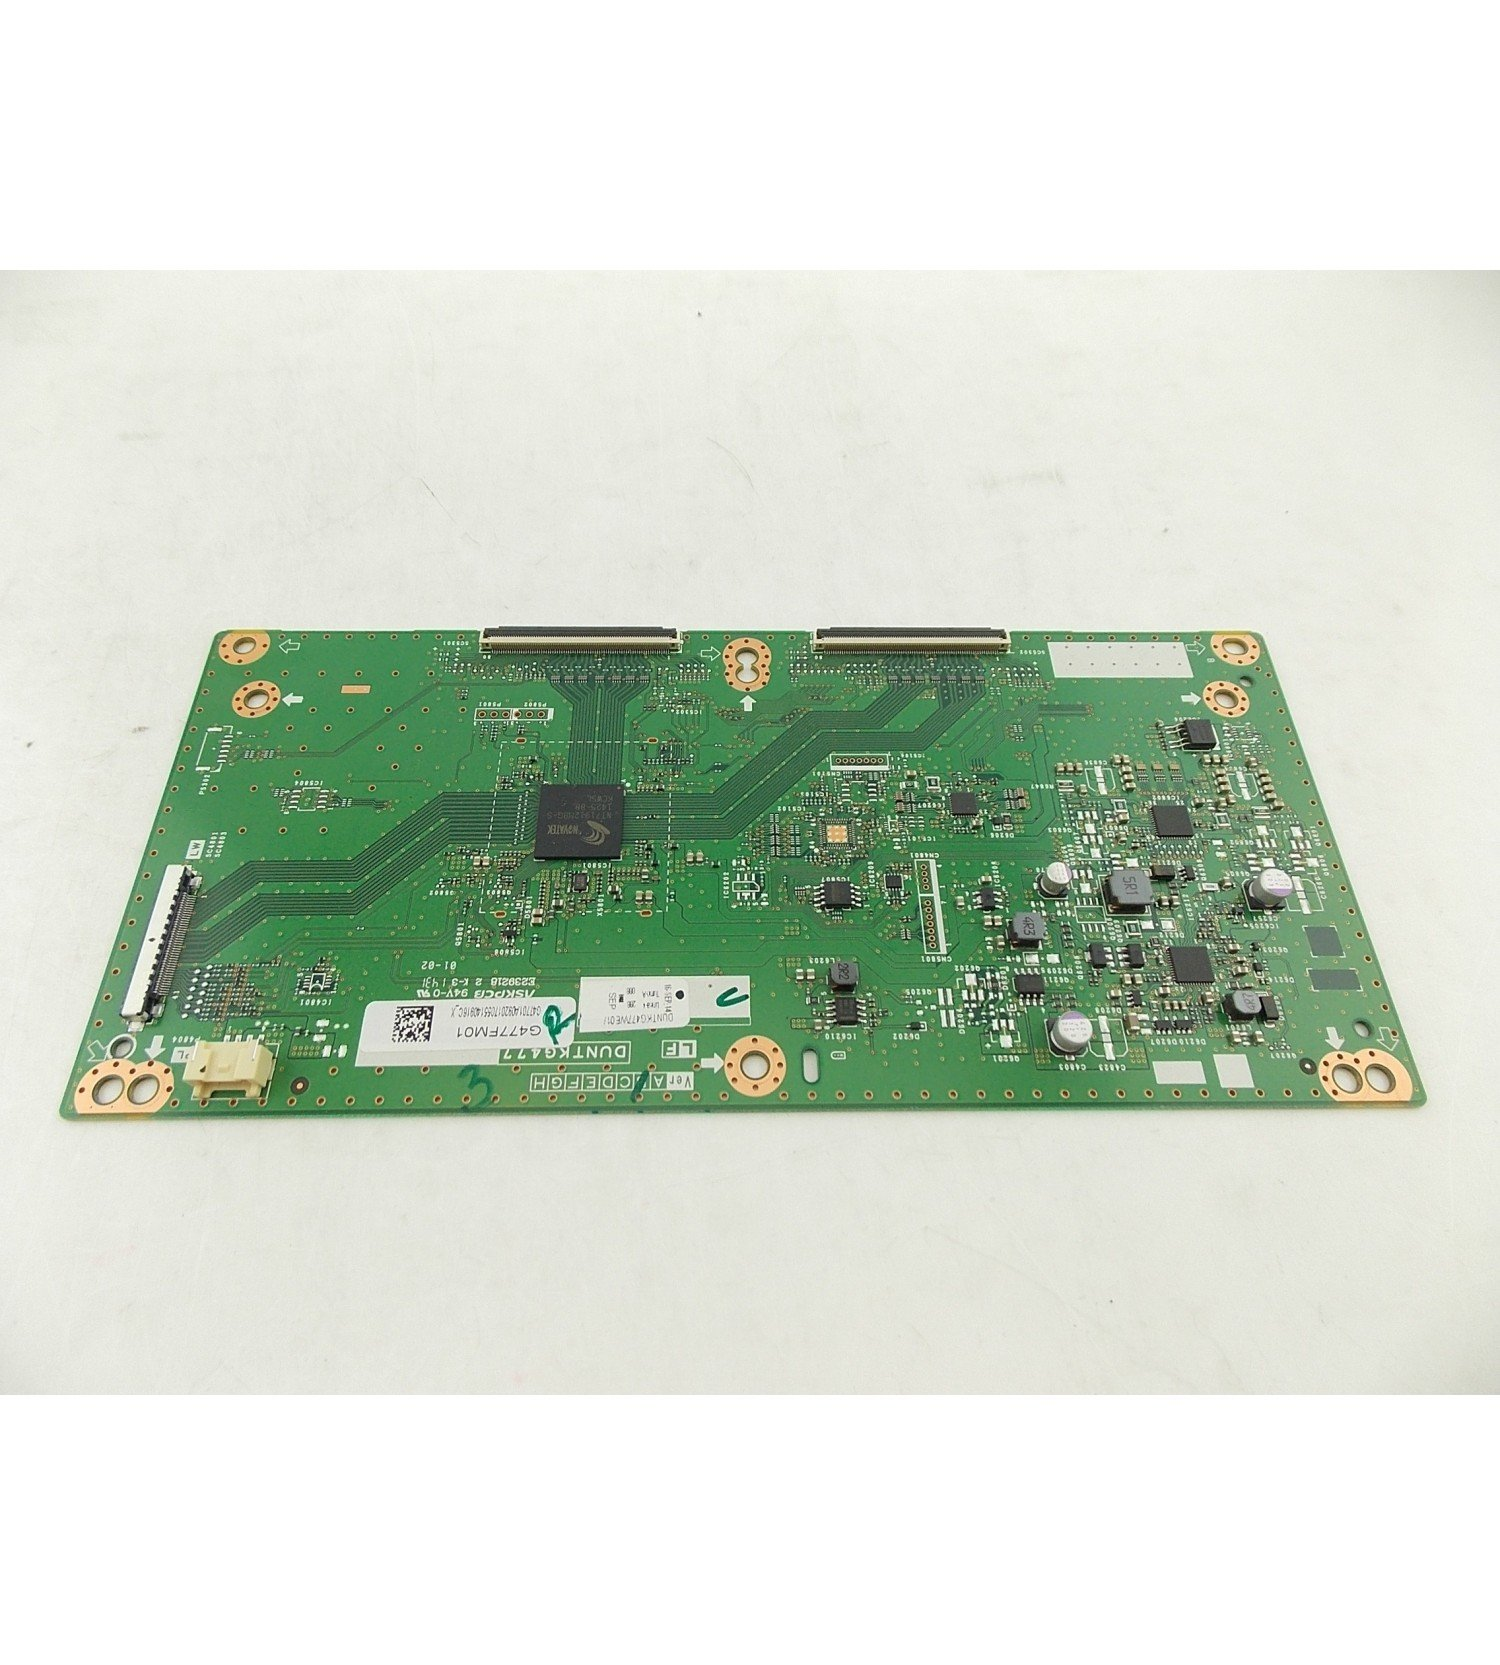 Sharp - Sharp LC-60LE660U Tcon Board DUNTKG477FM01 DUNTKG477 QPWBXG477WJZZ #V11316 - #V11316